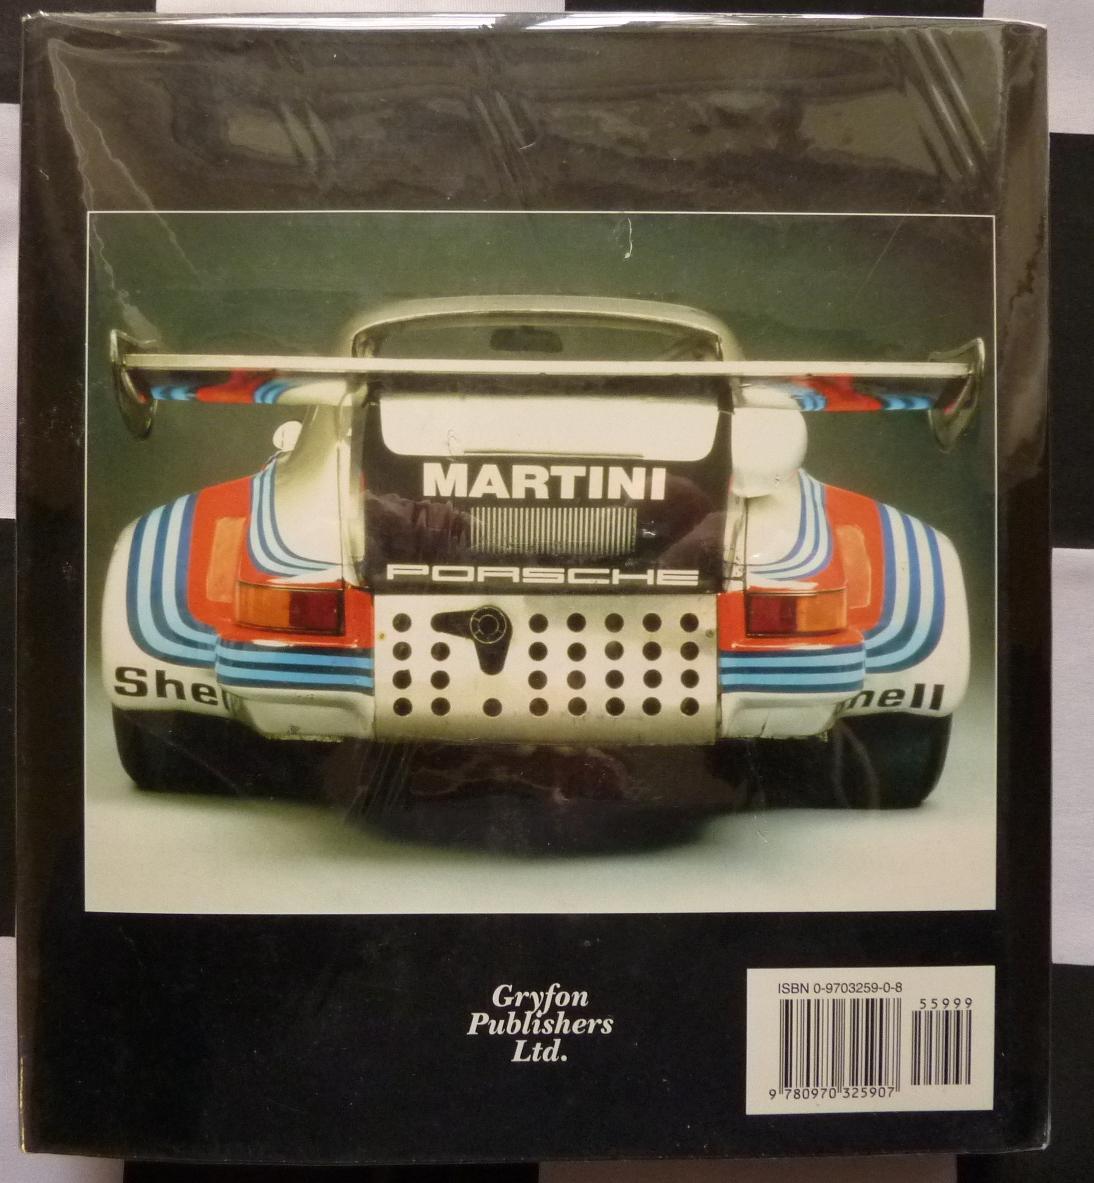 Used Porsche 911 Turbo Near Me: 930 To 935 The Turbo Porsches By Starkey, John: Renwick